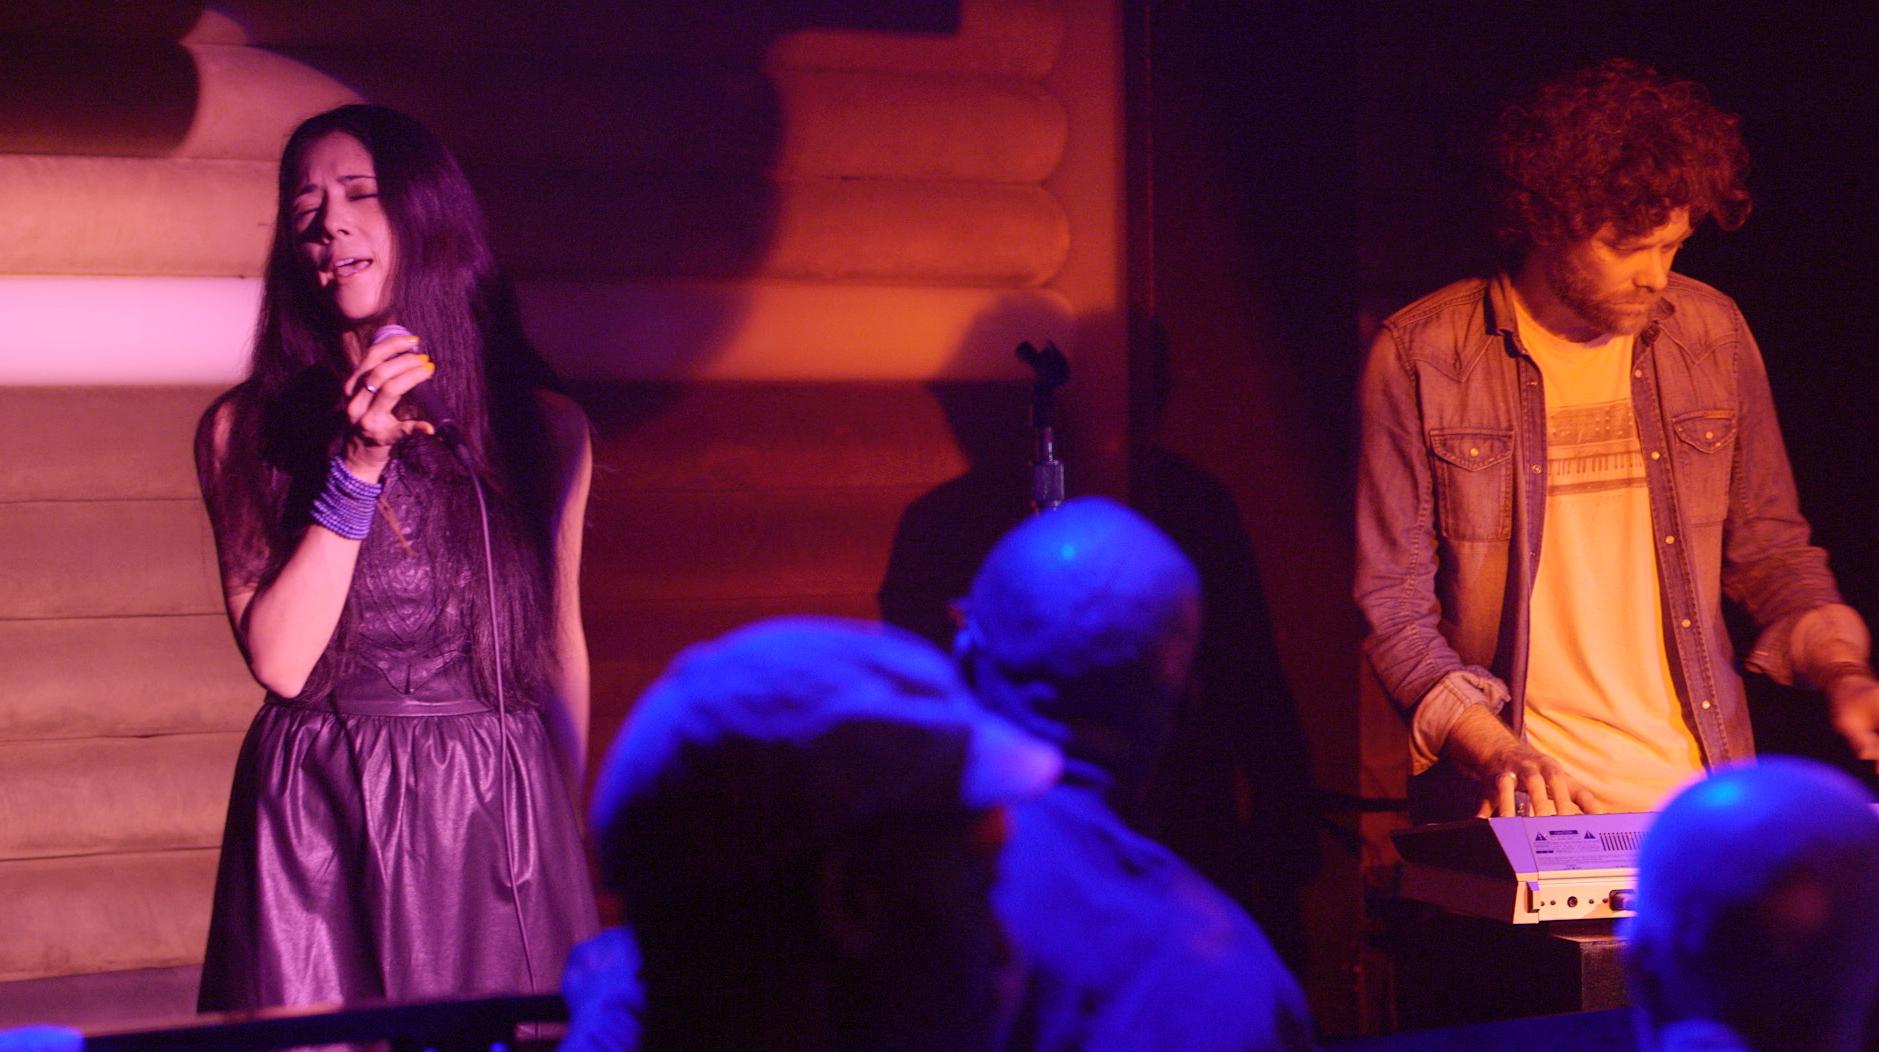 Show at Cielo. Monday was featured by Louie Vega's Roots event. Simone played keys.  マンデイさん、なんとあのMasters At Workのルイ・ヴェガでのイベントのライヴでしたした。 かなり色んな人種入り乱れて踊り狂っていました。流石マンデイ姉さんです!